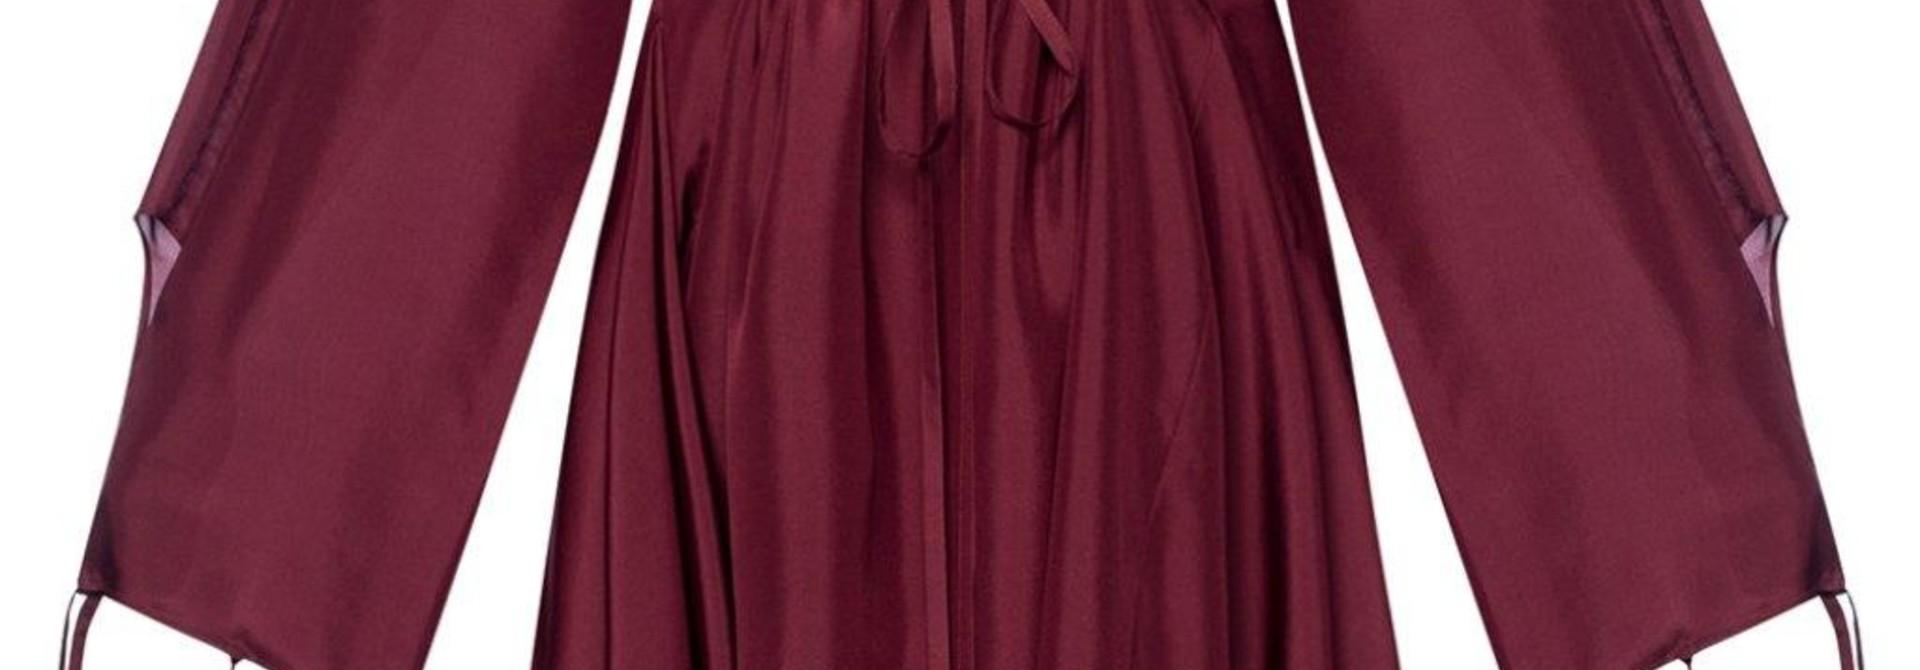 Silk Dress  - Burgundy - Sz 38